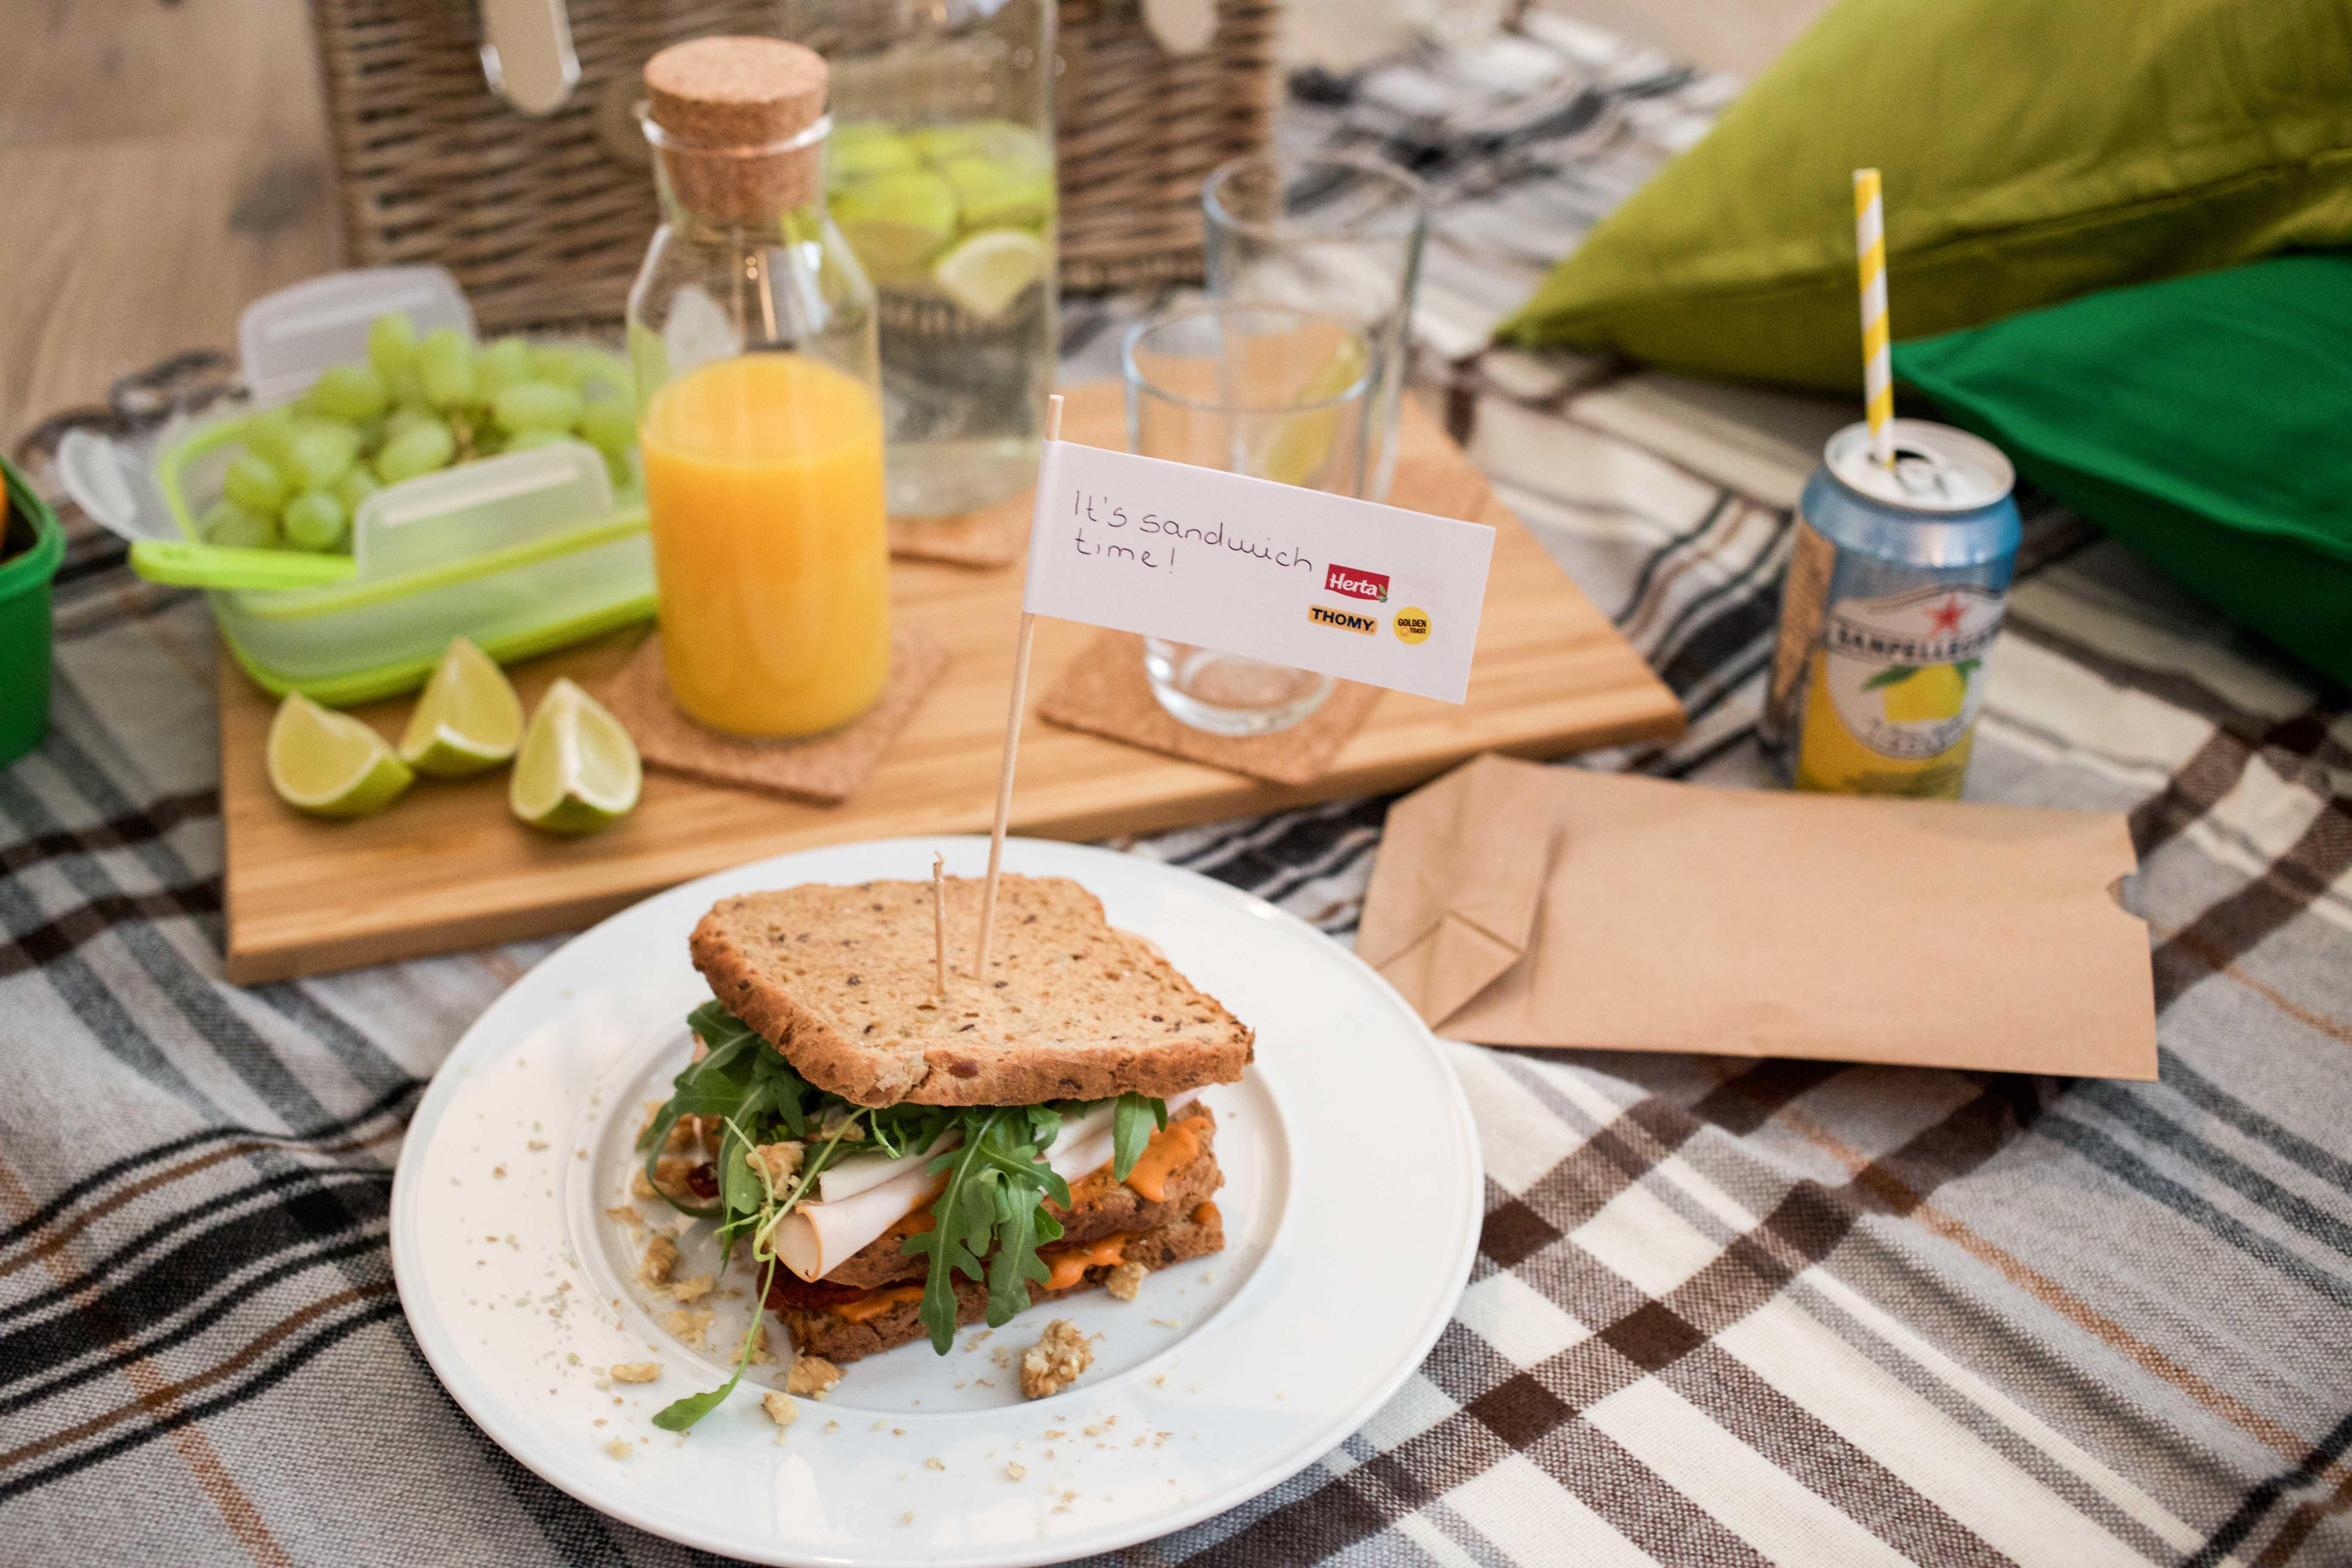 herta-finesse-workshop-berlin-sandwich-makeover-mittagspause-lunch-rezept-rezeptideen_5970